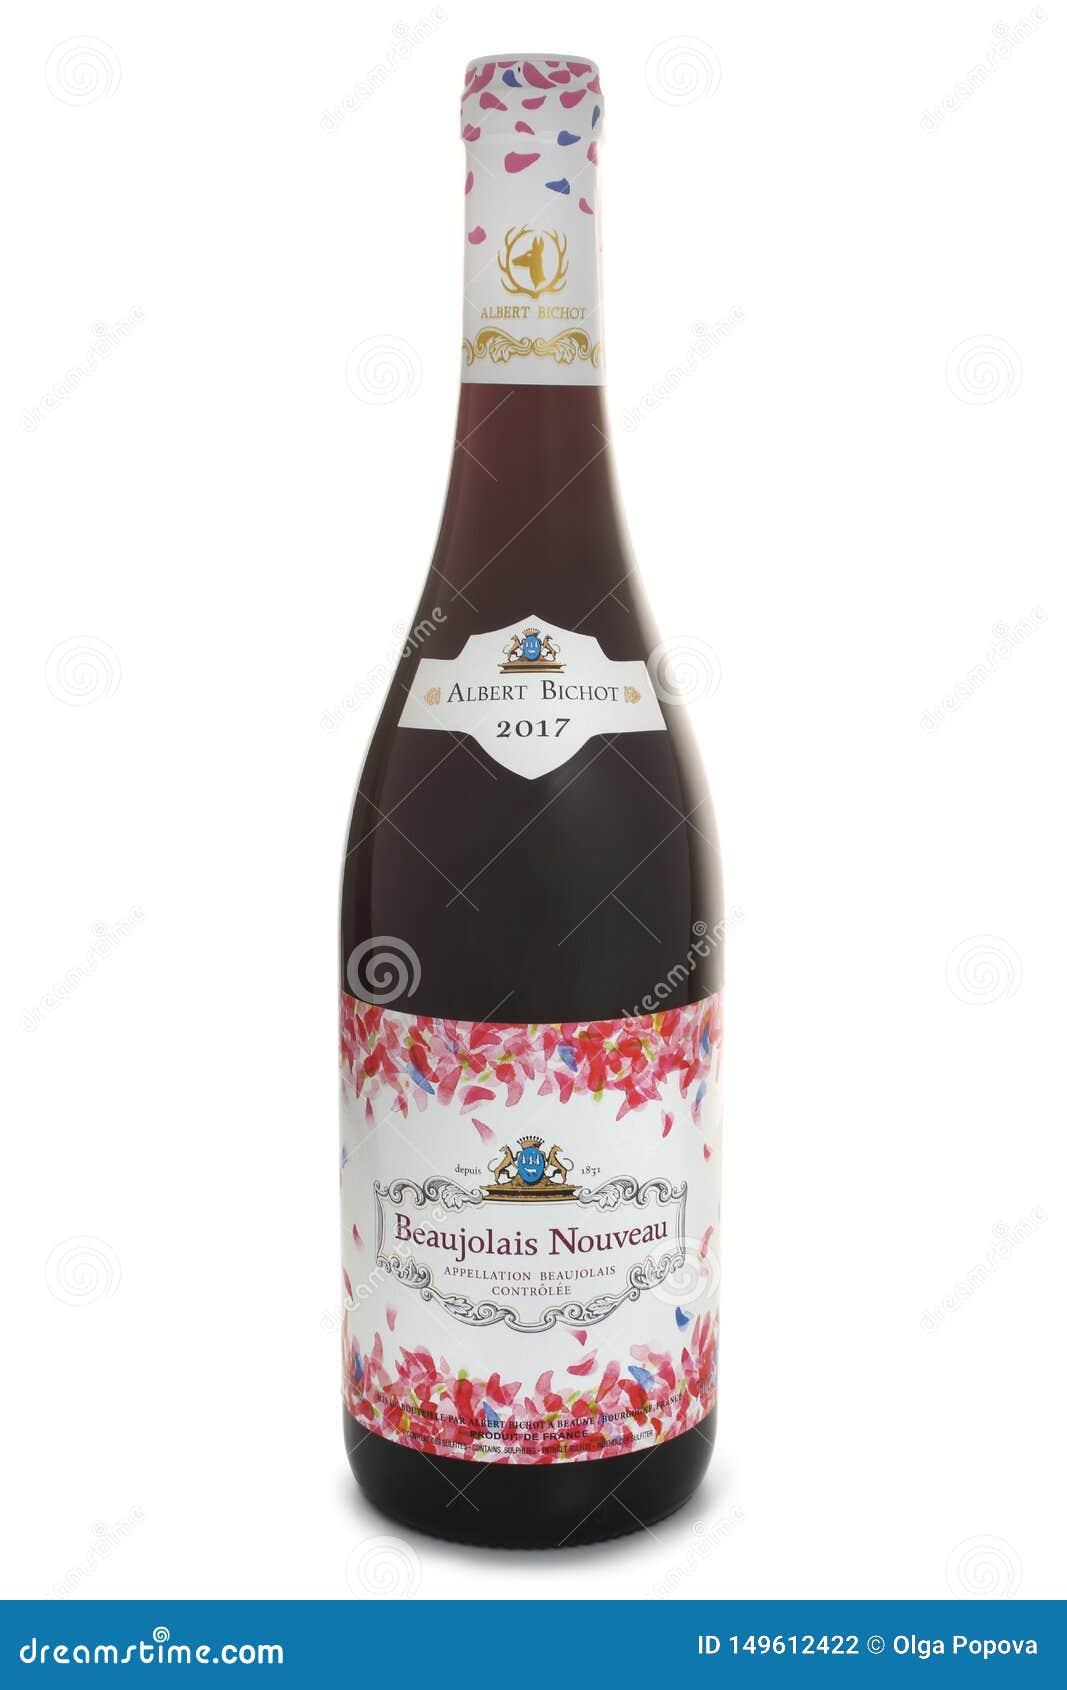 St PIETROBURGO, RUSSIA - 19 NOVEMBRE 2017: Bottiglia di Albert Bichot Beaujolais Nouveau, Borgogna, Francia, 2017